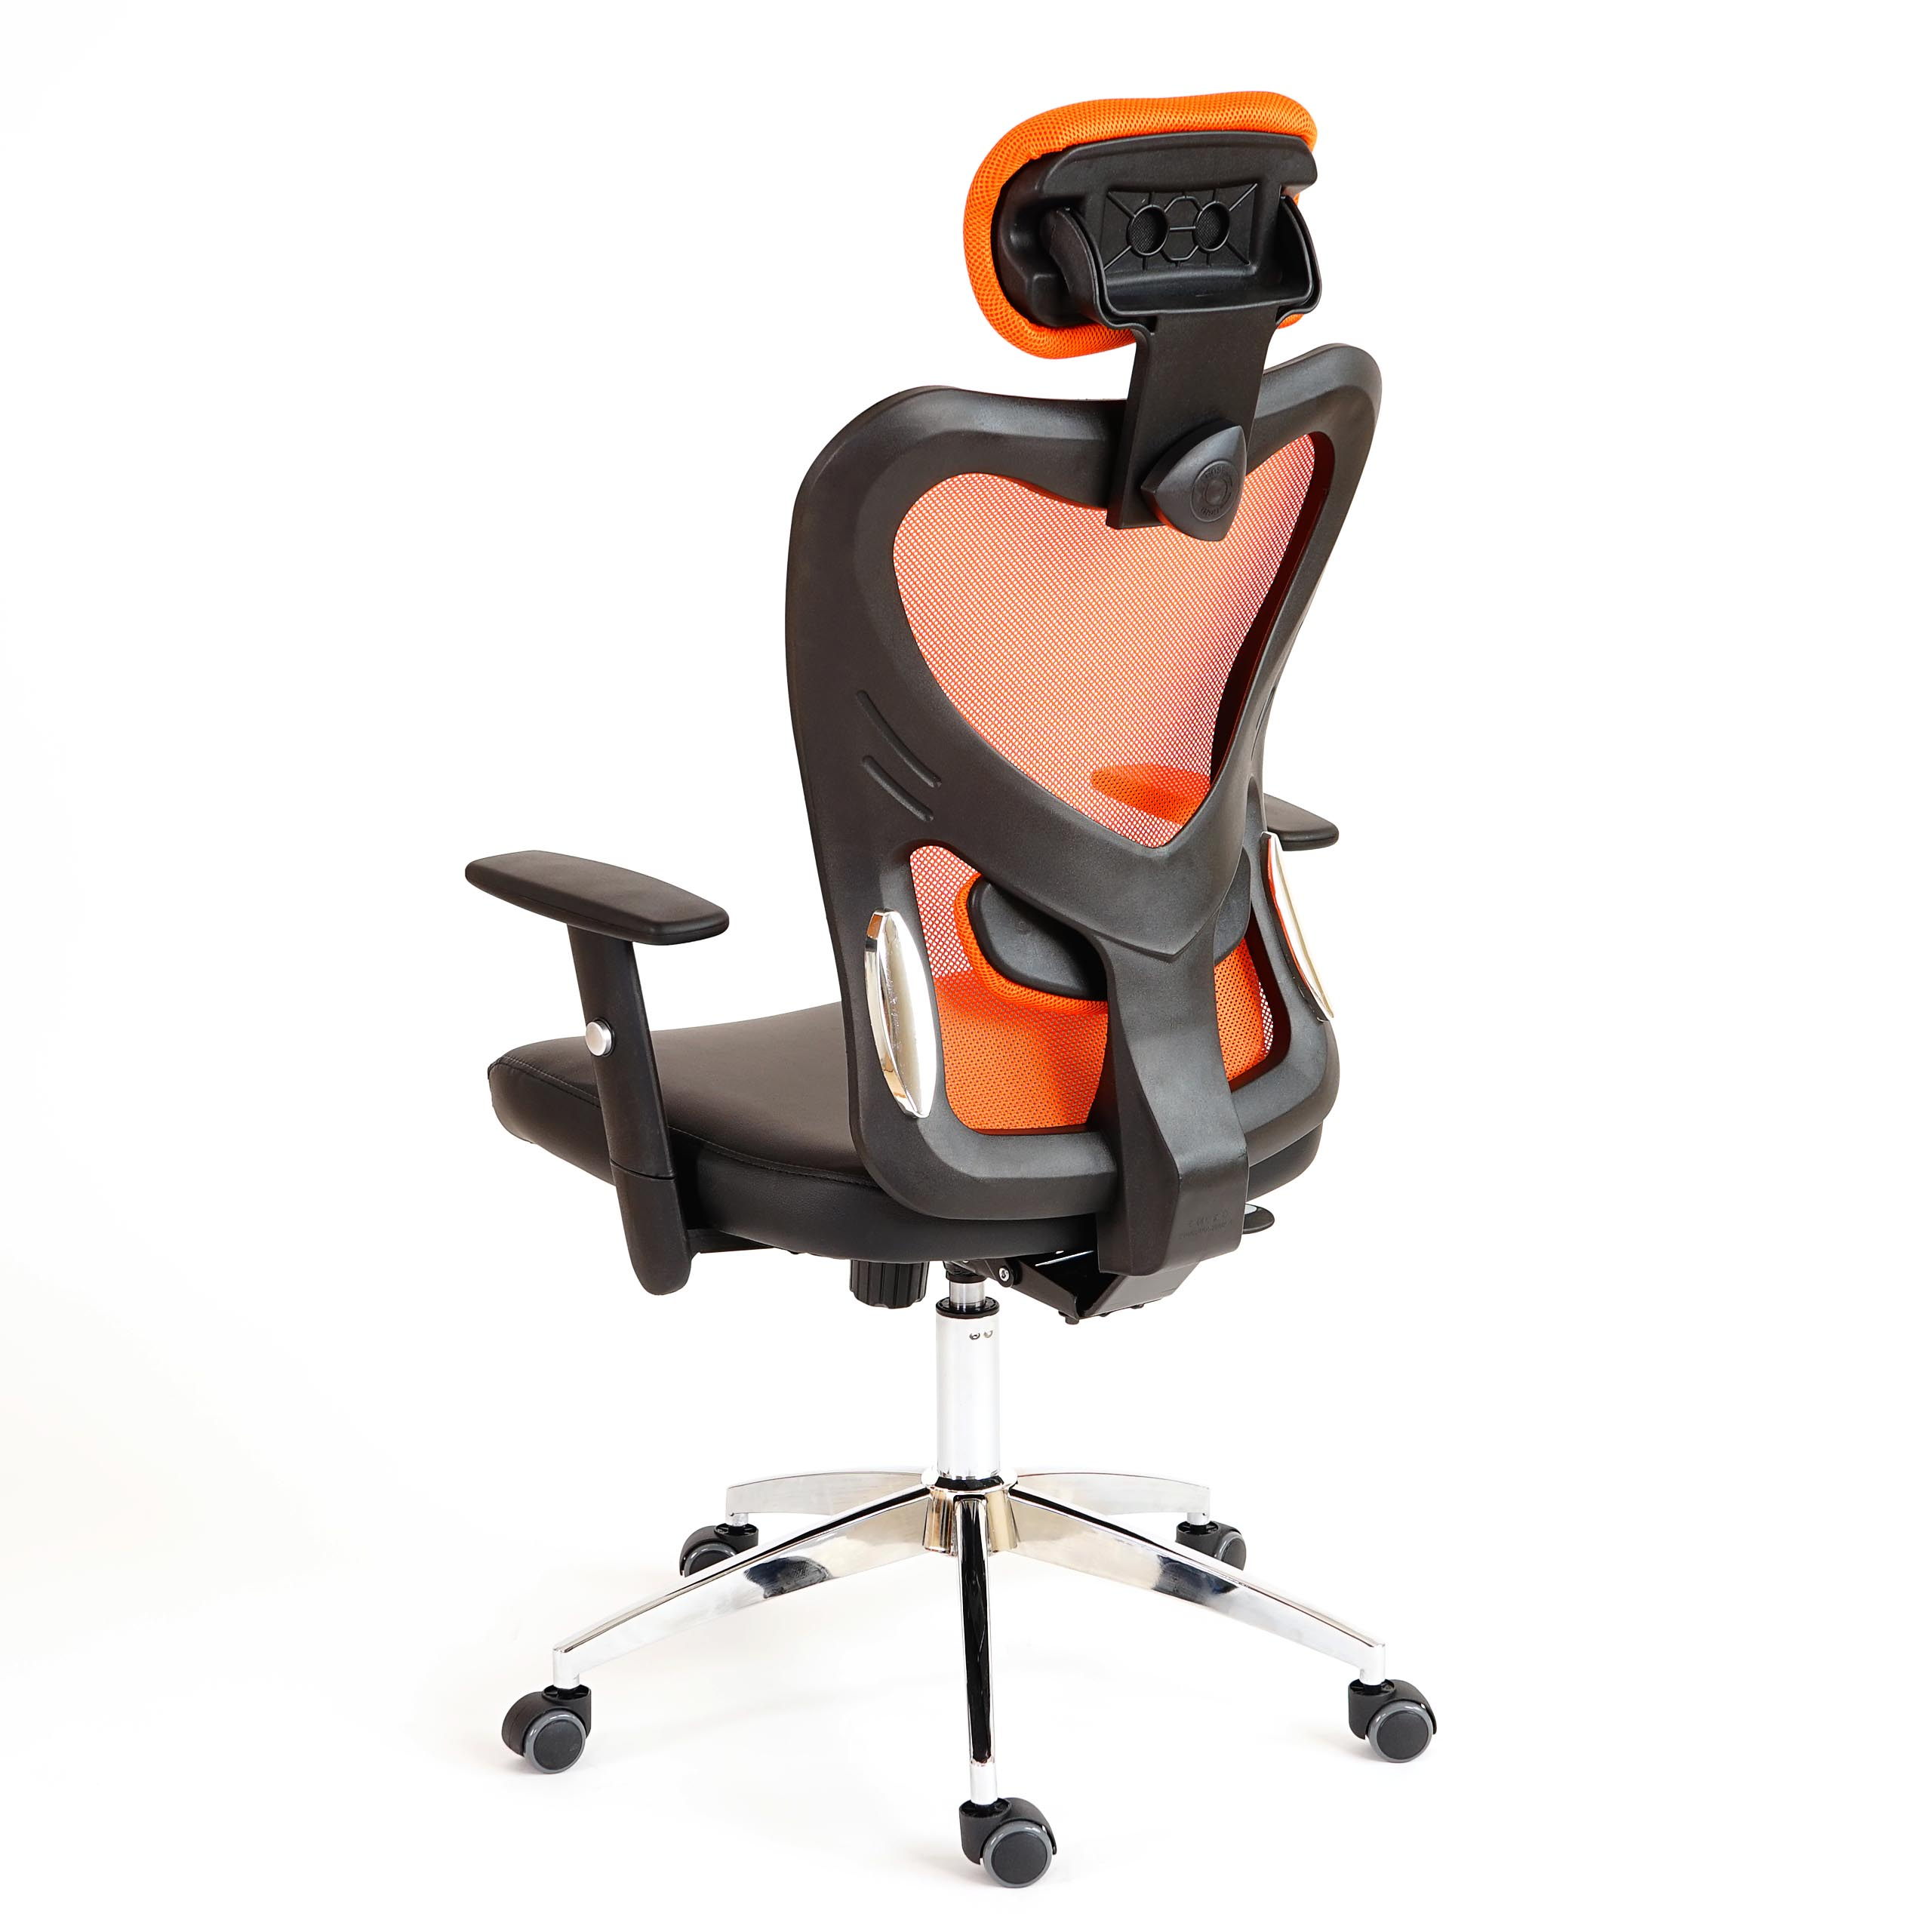 fauteuil de bureau am ricain atlanta xxl charge 150kg similicuir orange ebay. Black Bedroom Furniture Sets. Home Design Ideas